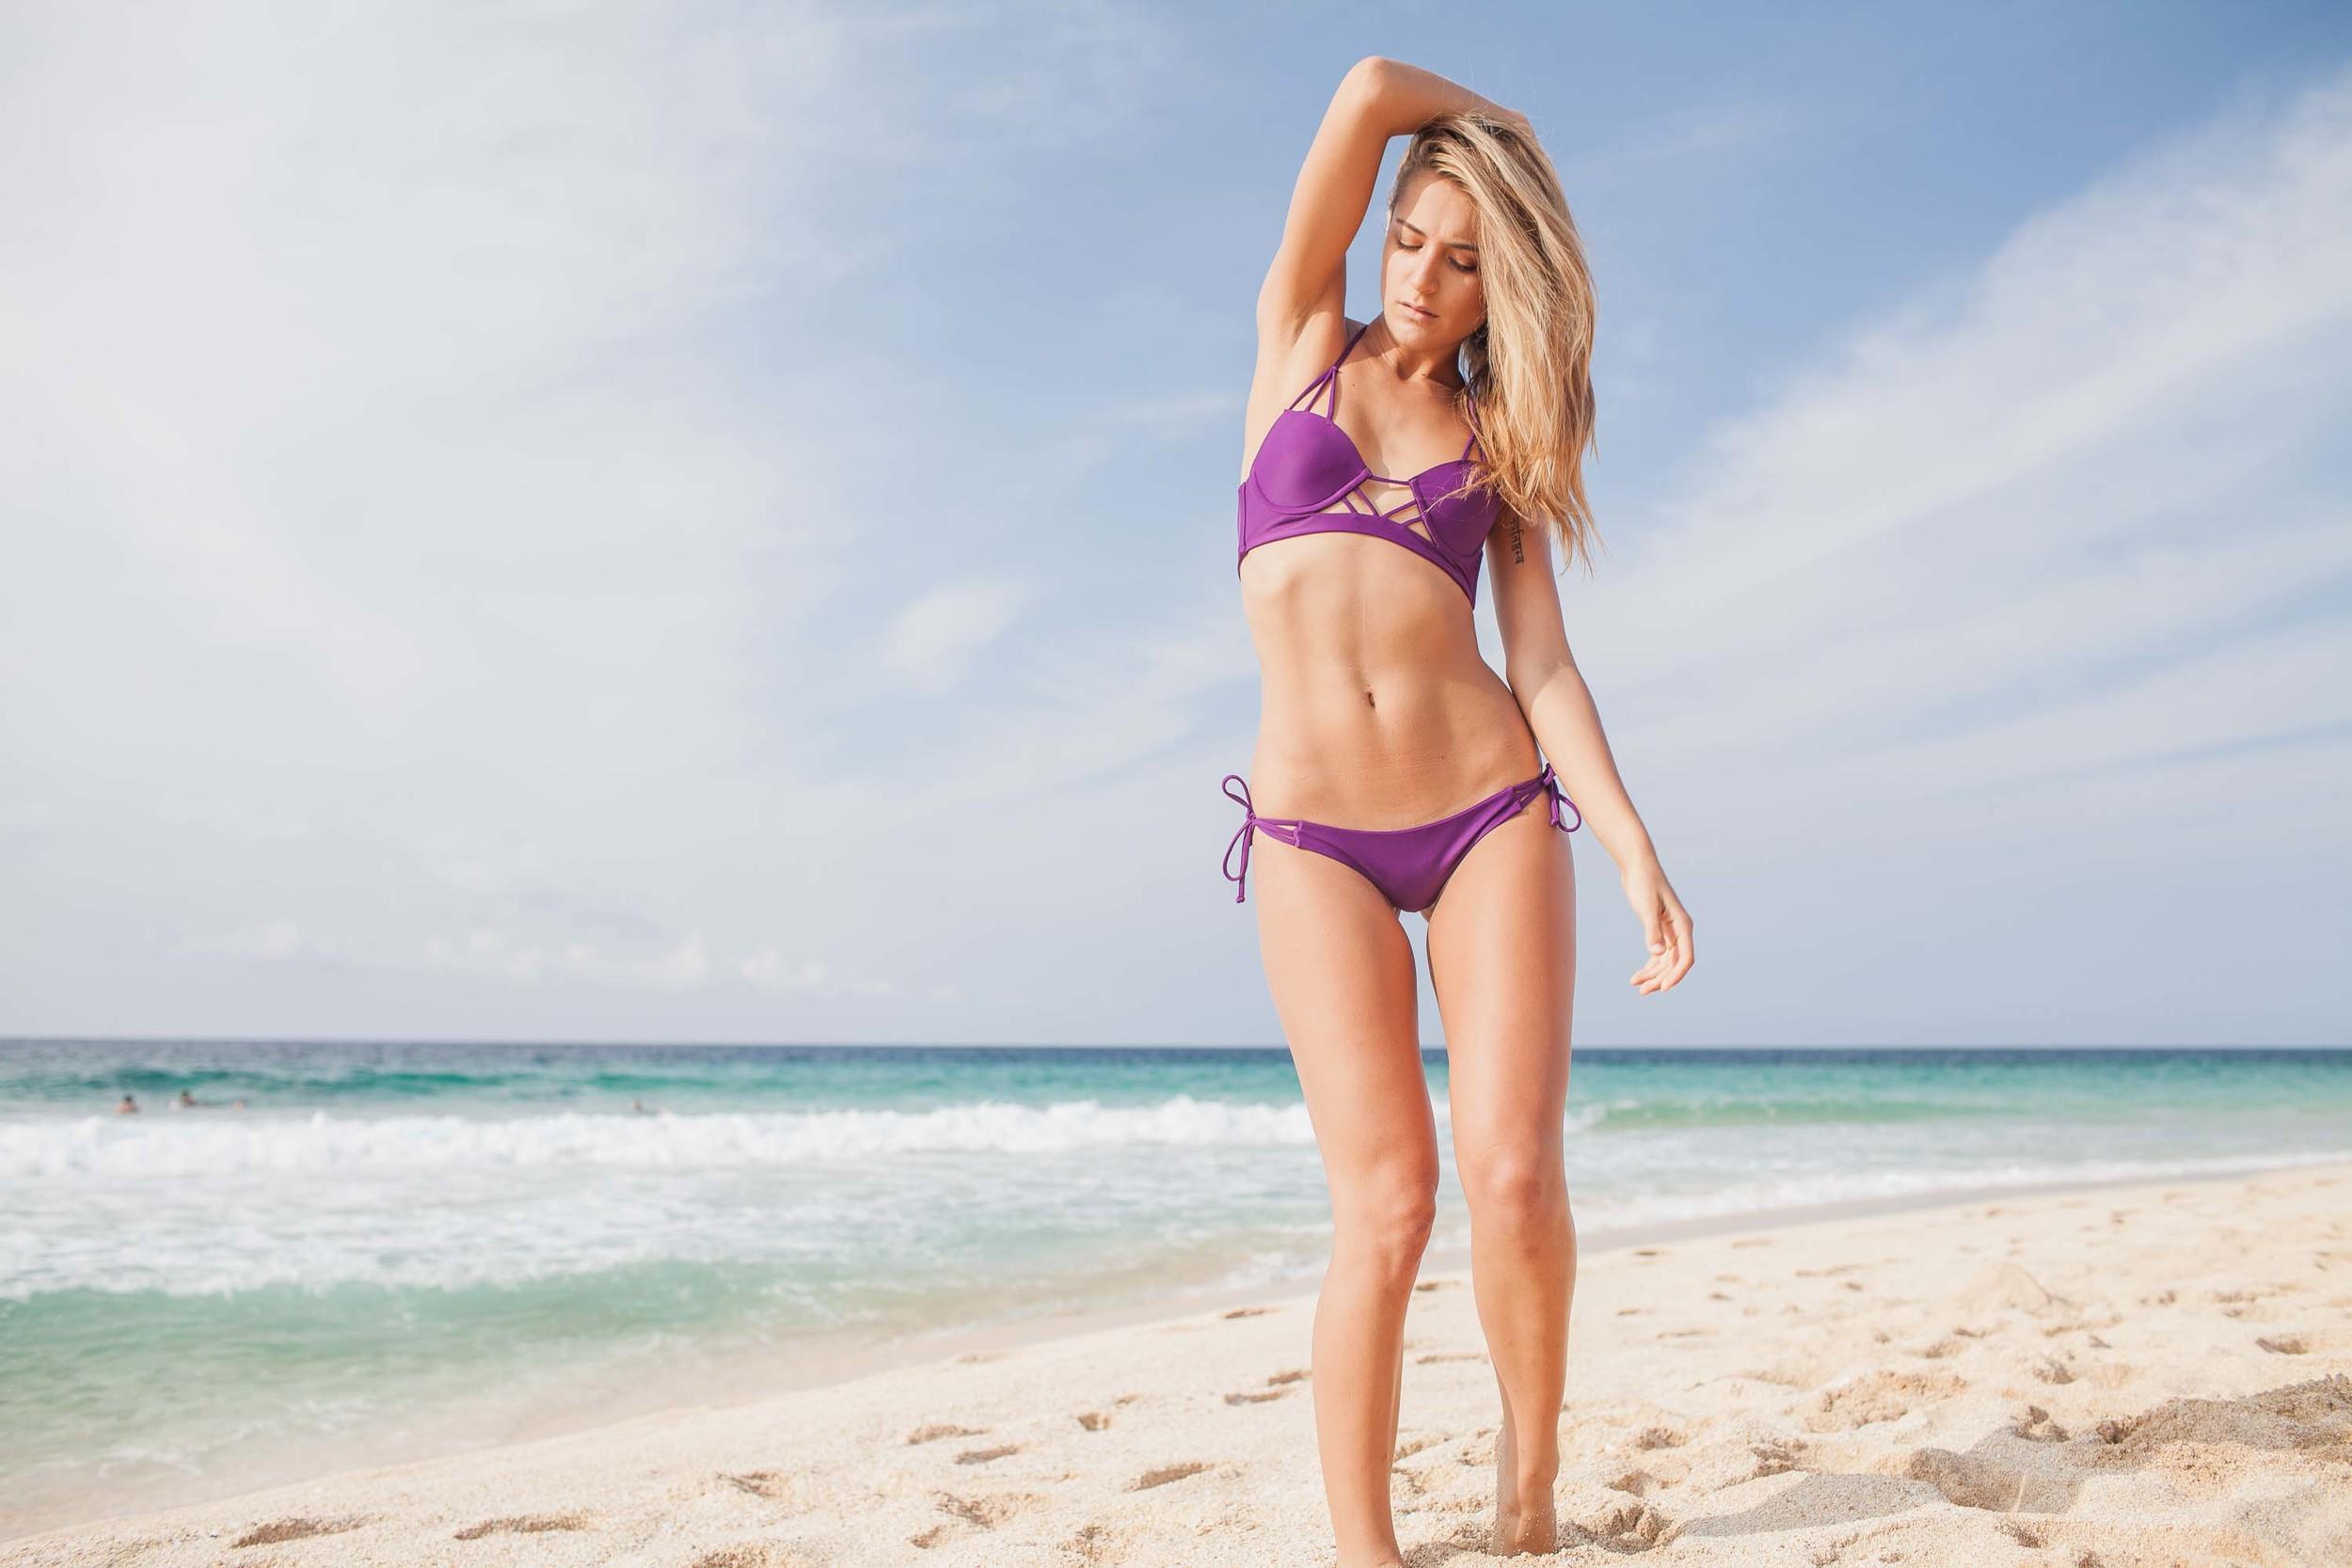 bryce-johnson-issademar-glee-actor-model-bikini-hawaii-4.jpg